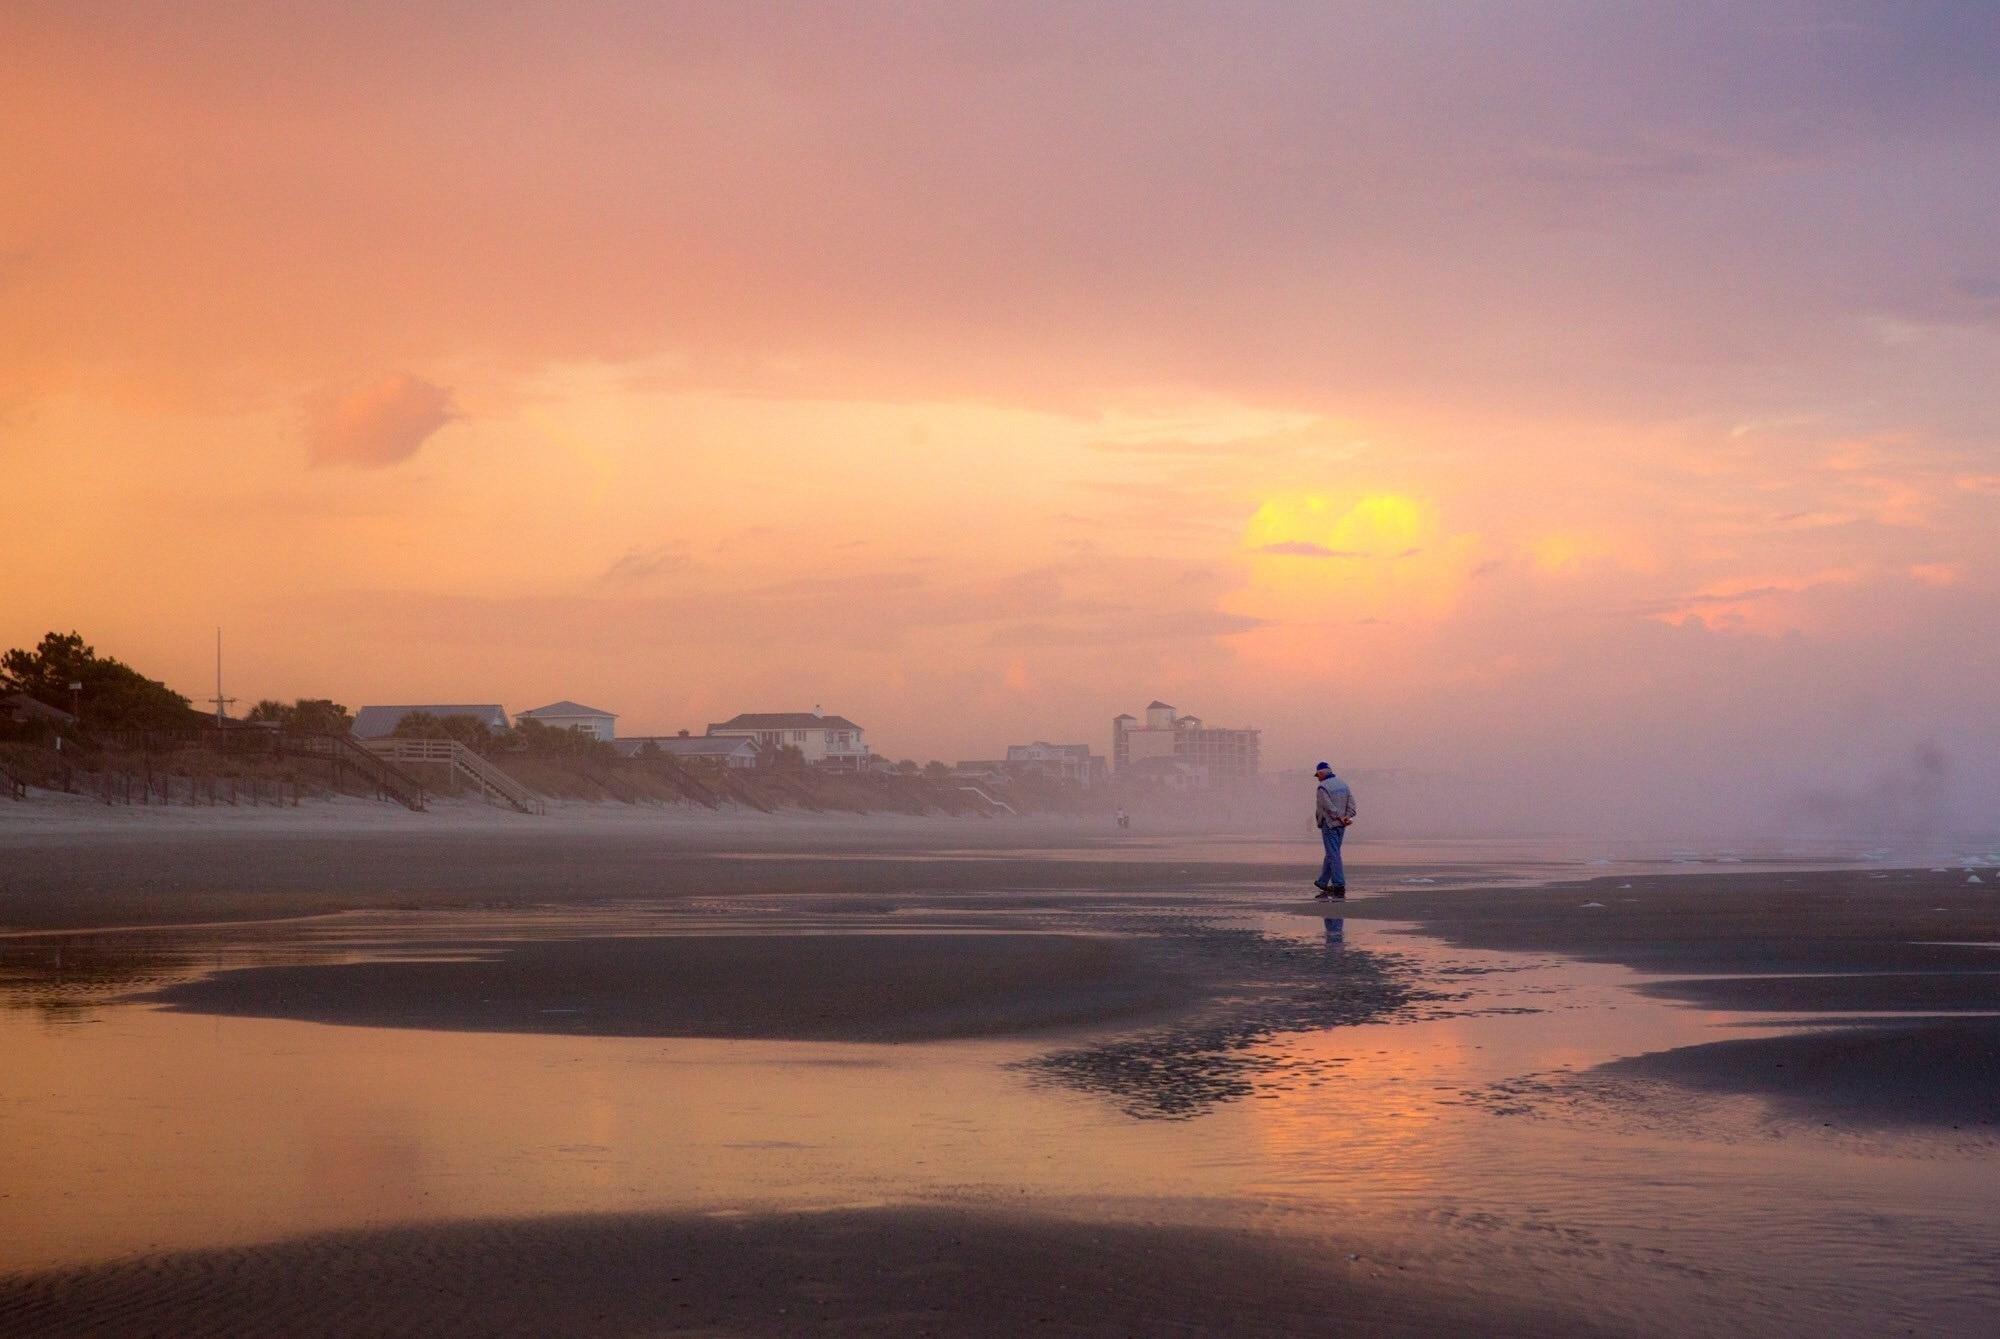 Litchfield by the Sea, South Carolina, United States of America